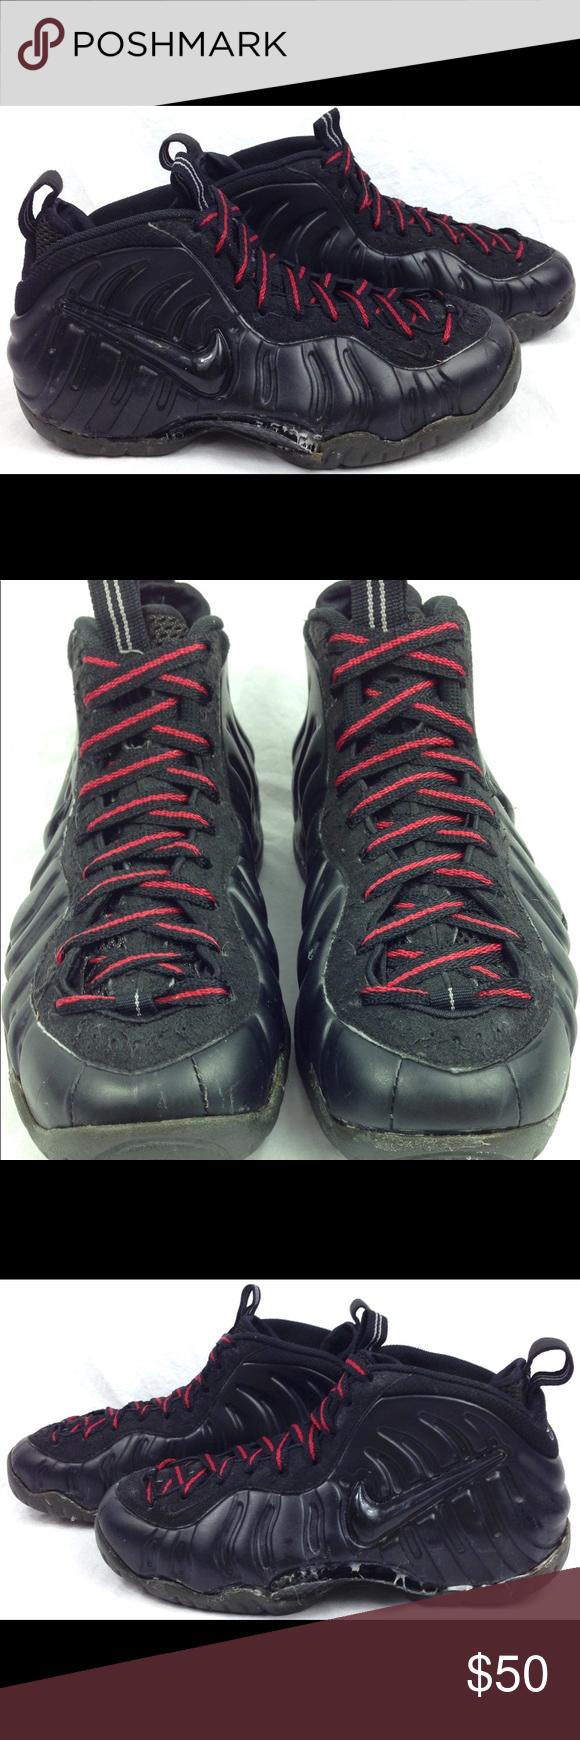 pretty nice 63361 91344 Vintage 2000 Nike Air Foamposite Pro